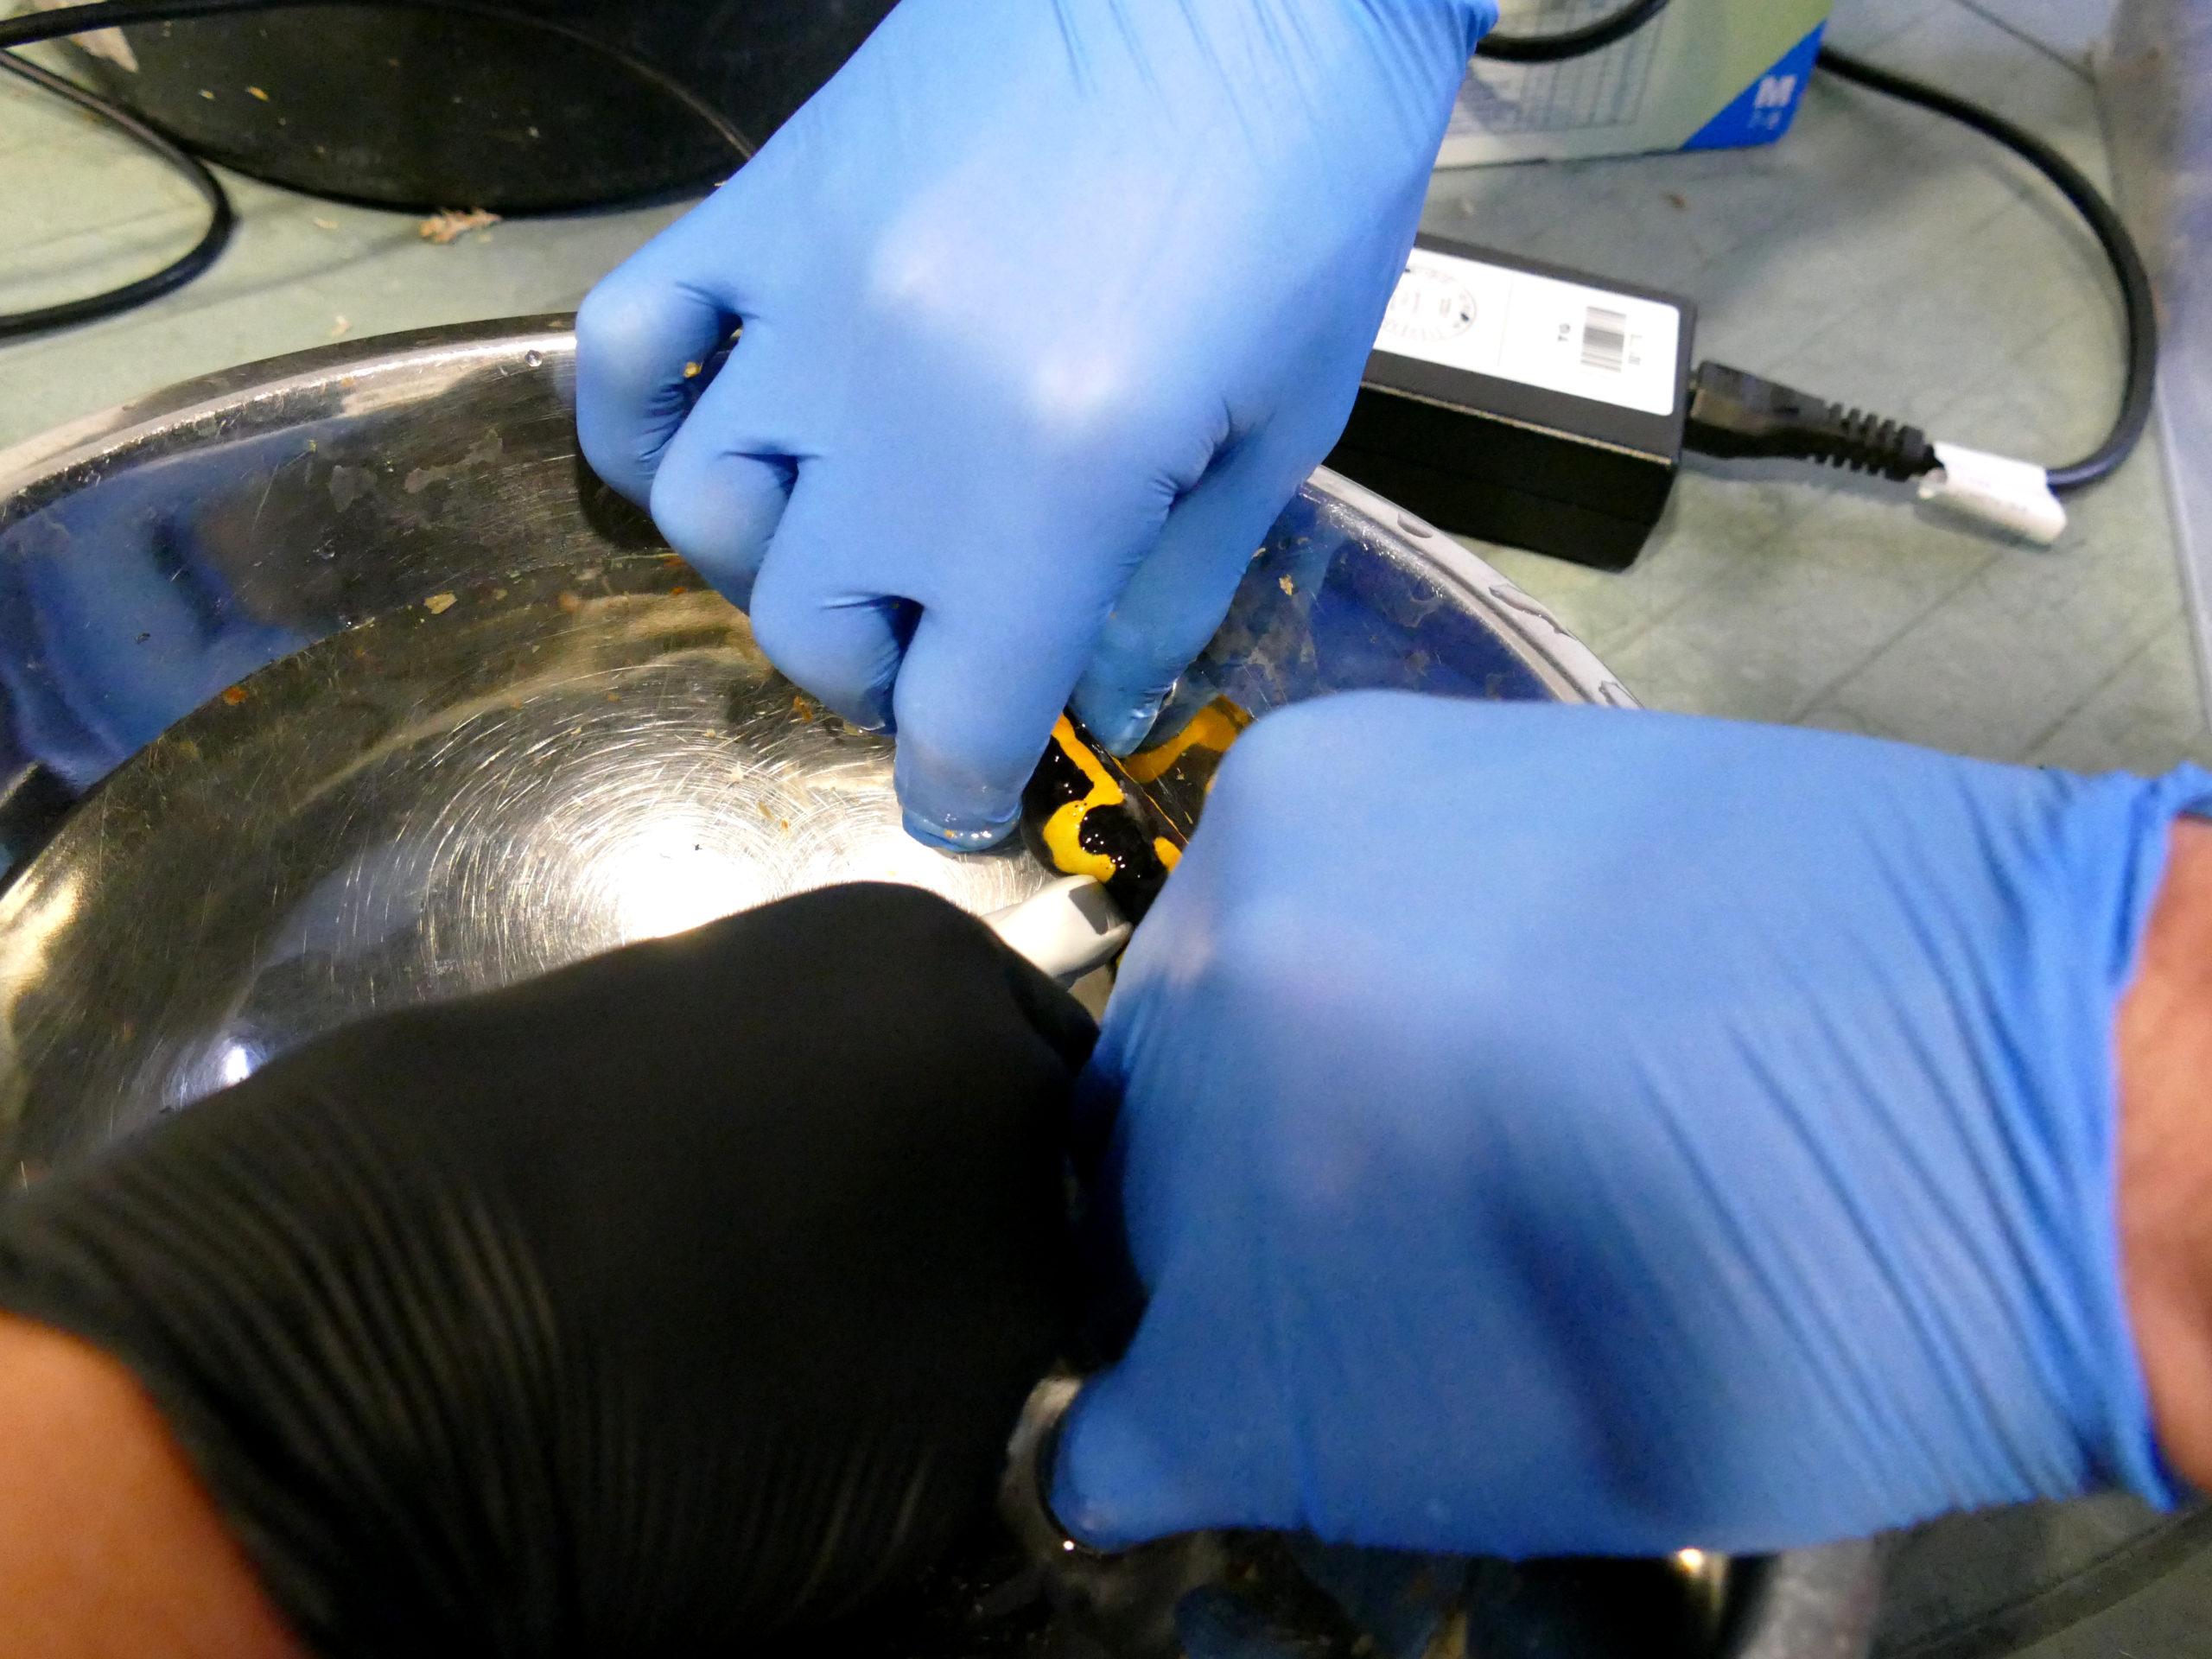 Ein Ultraschall bei Feuersalamandern erfordert viel Fingerspitzengefühl | Tiergarten Nürnberg